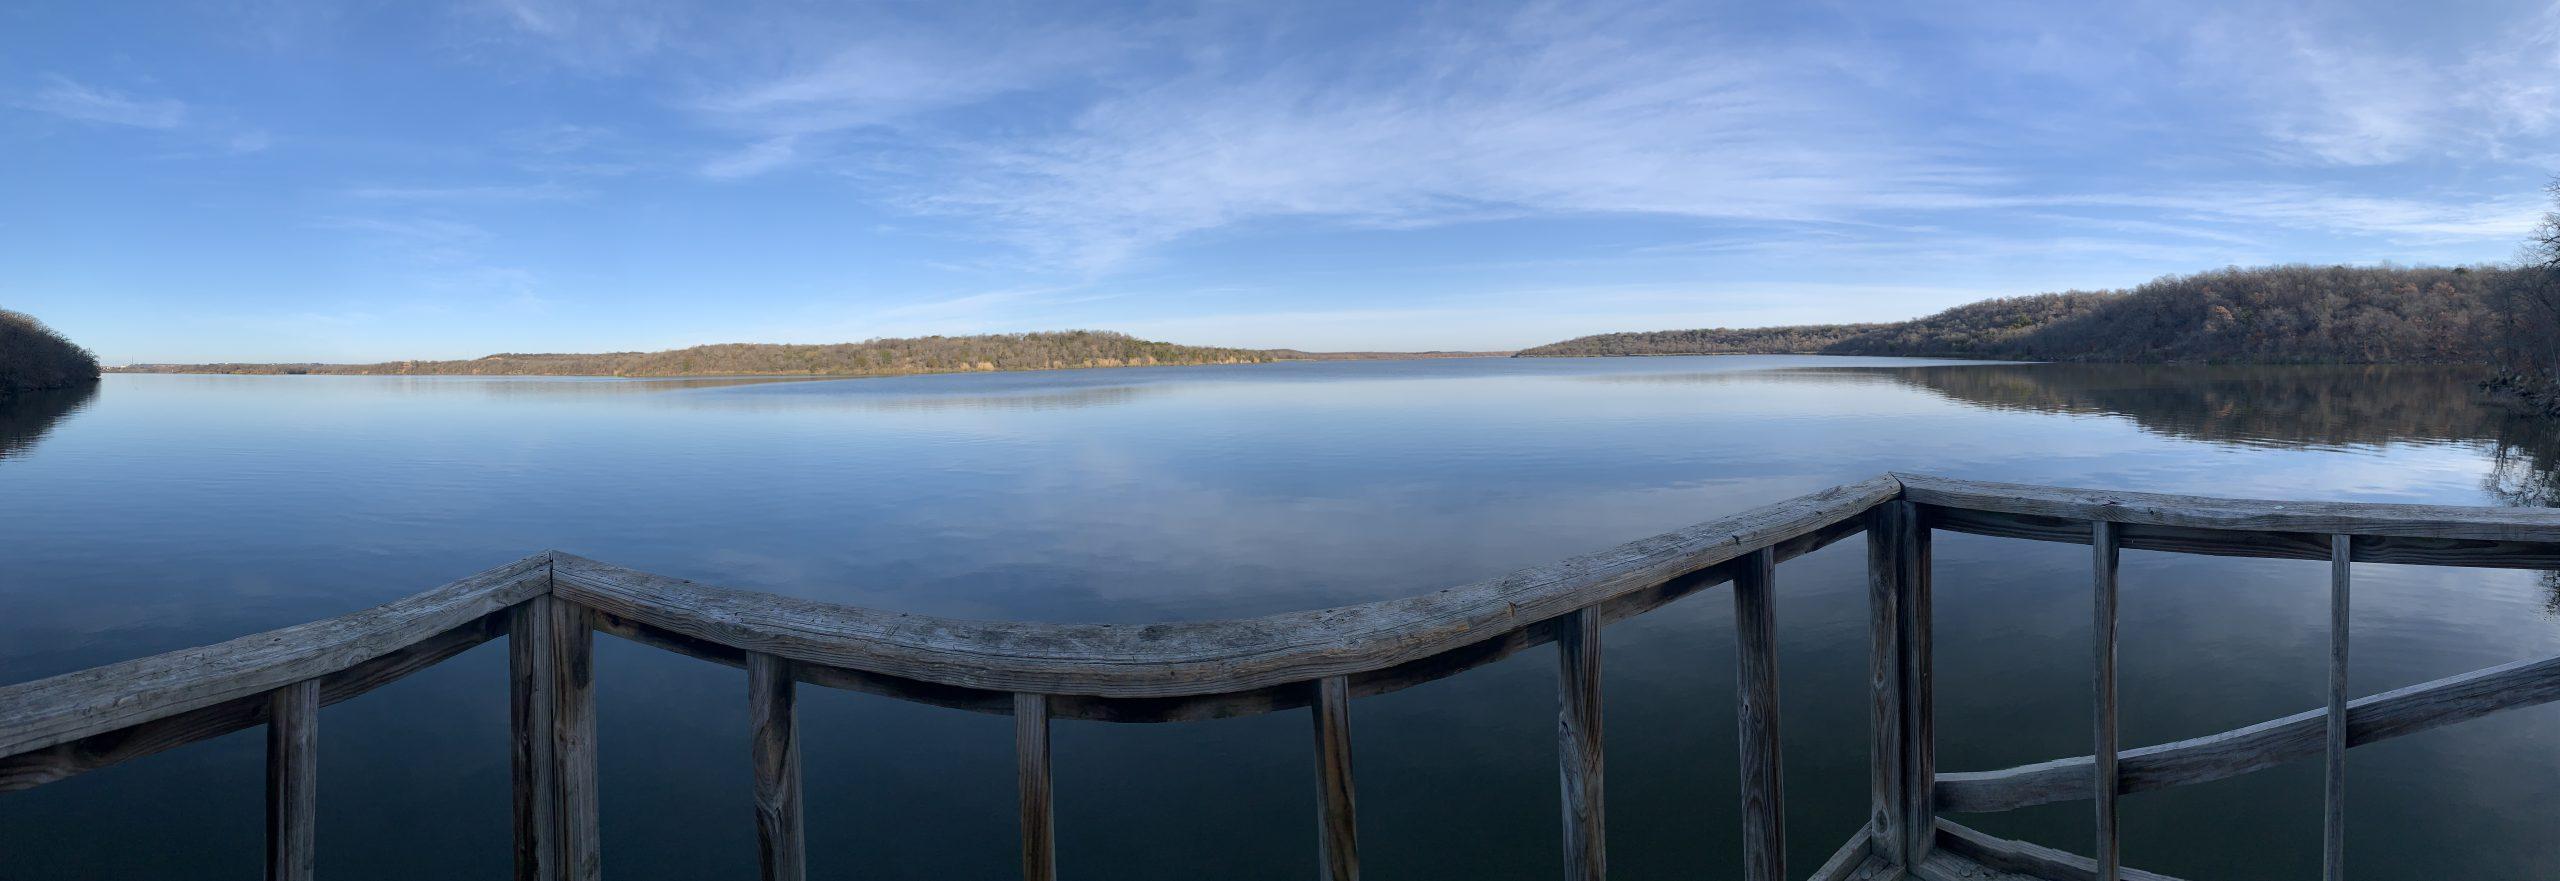 Lake Mineral Wells panoramic